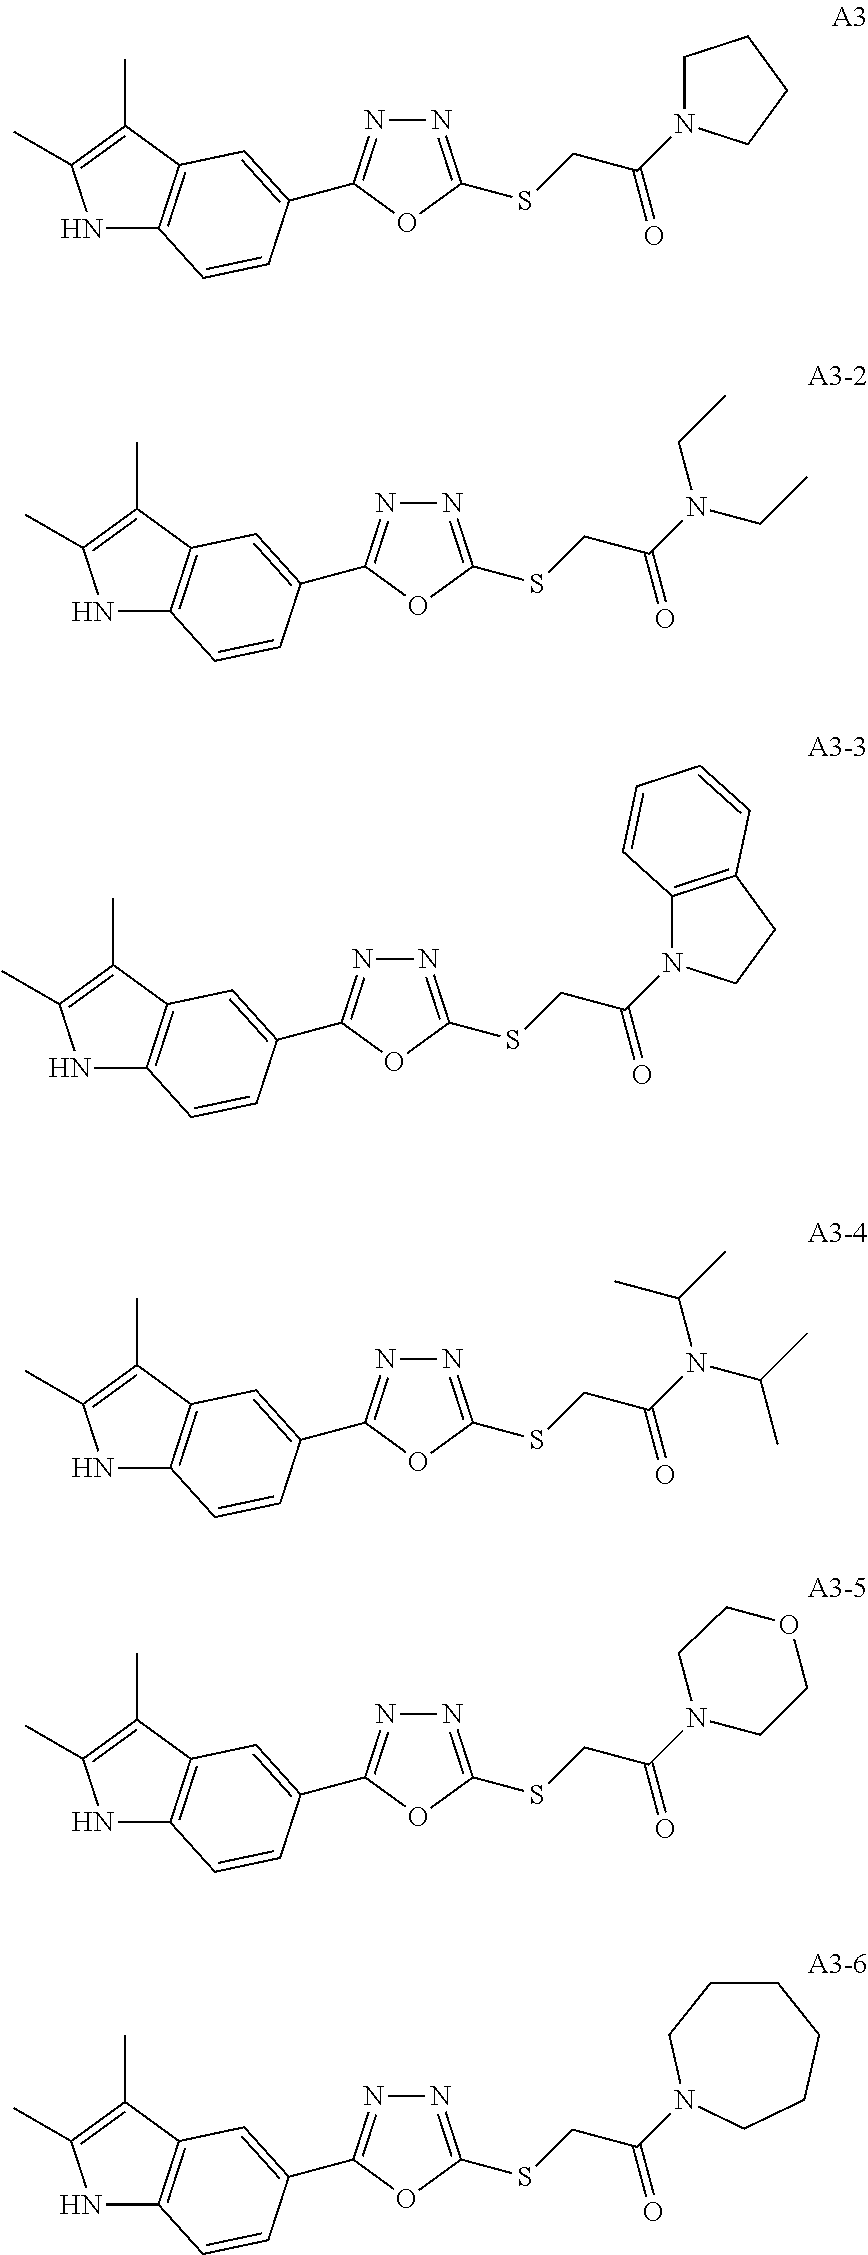 Us8629283b2 Compounds That Modulate Negative Sense Single 1996 B100 Fuse Box Diagram Figure Us08629283 20140114 C00002